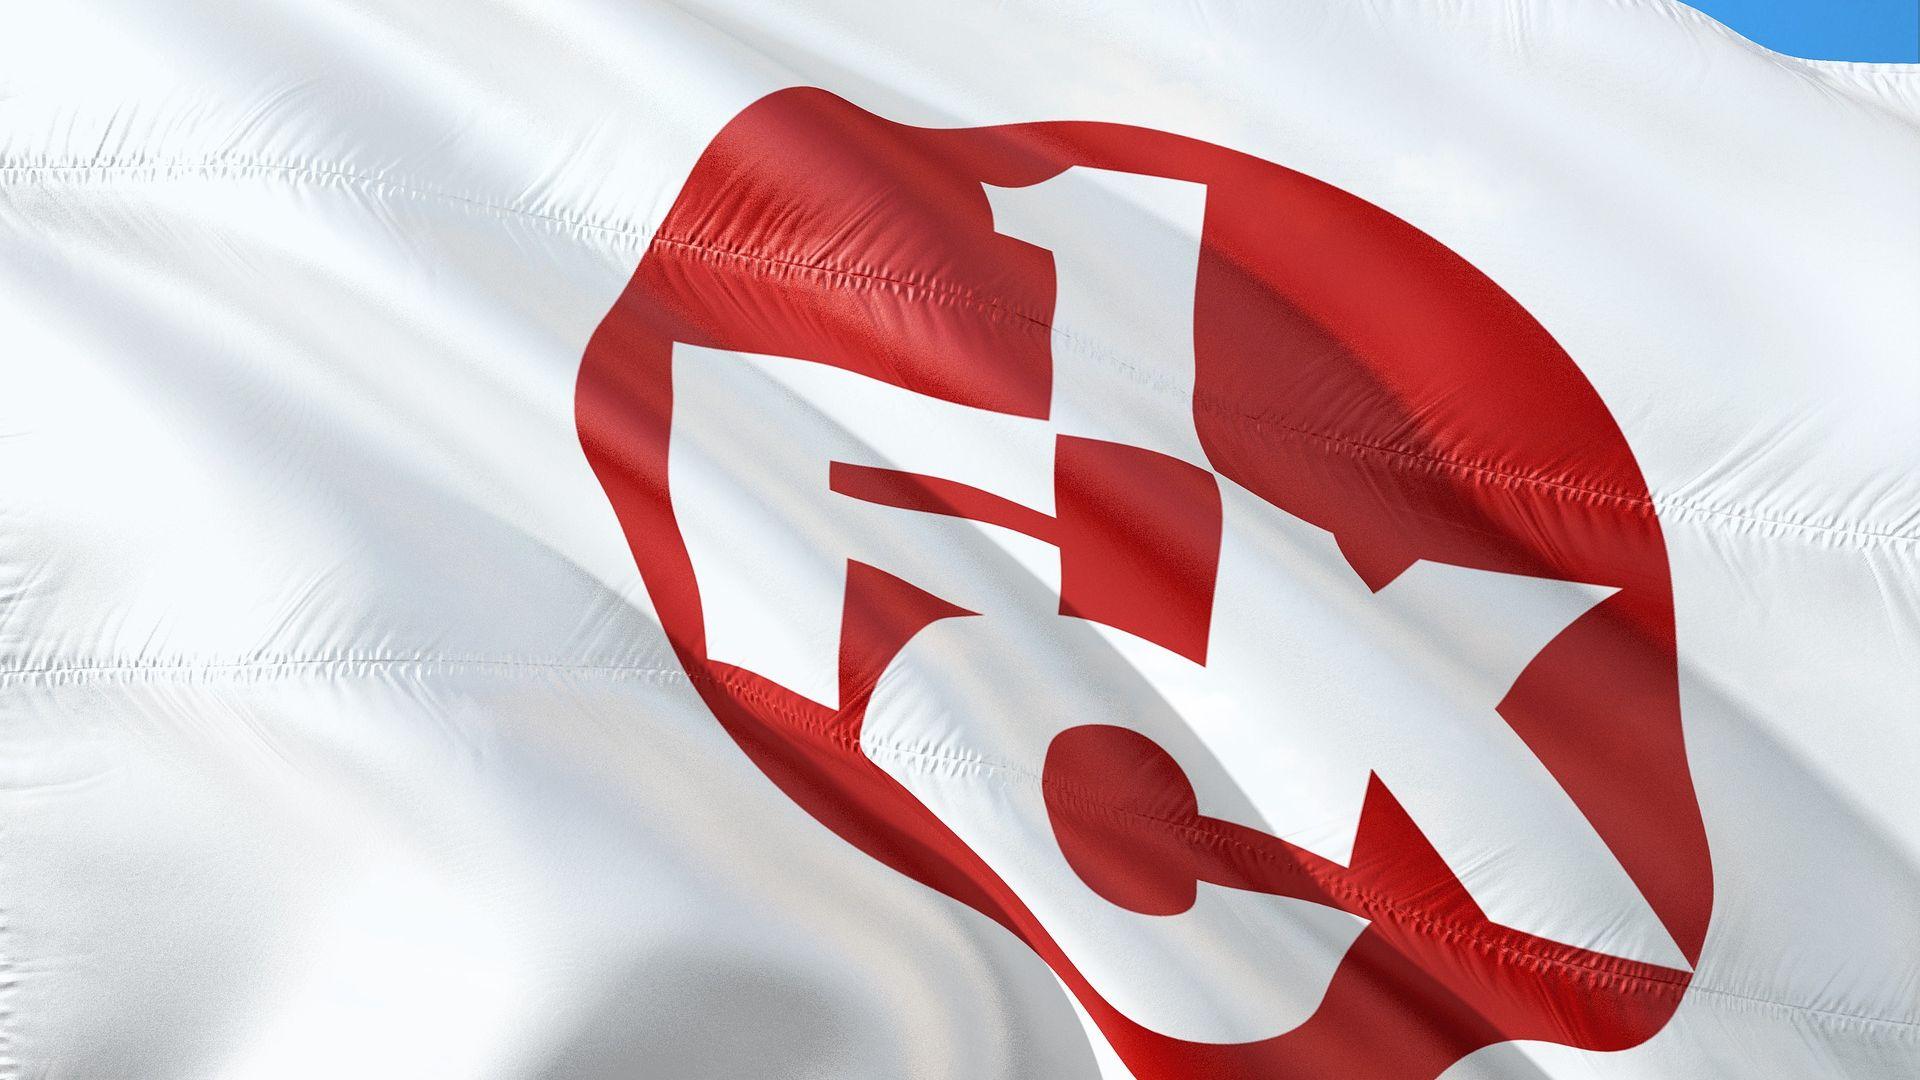 FCK stellt erneut Antrag auf Mietminderung-Image